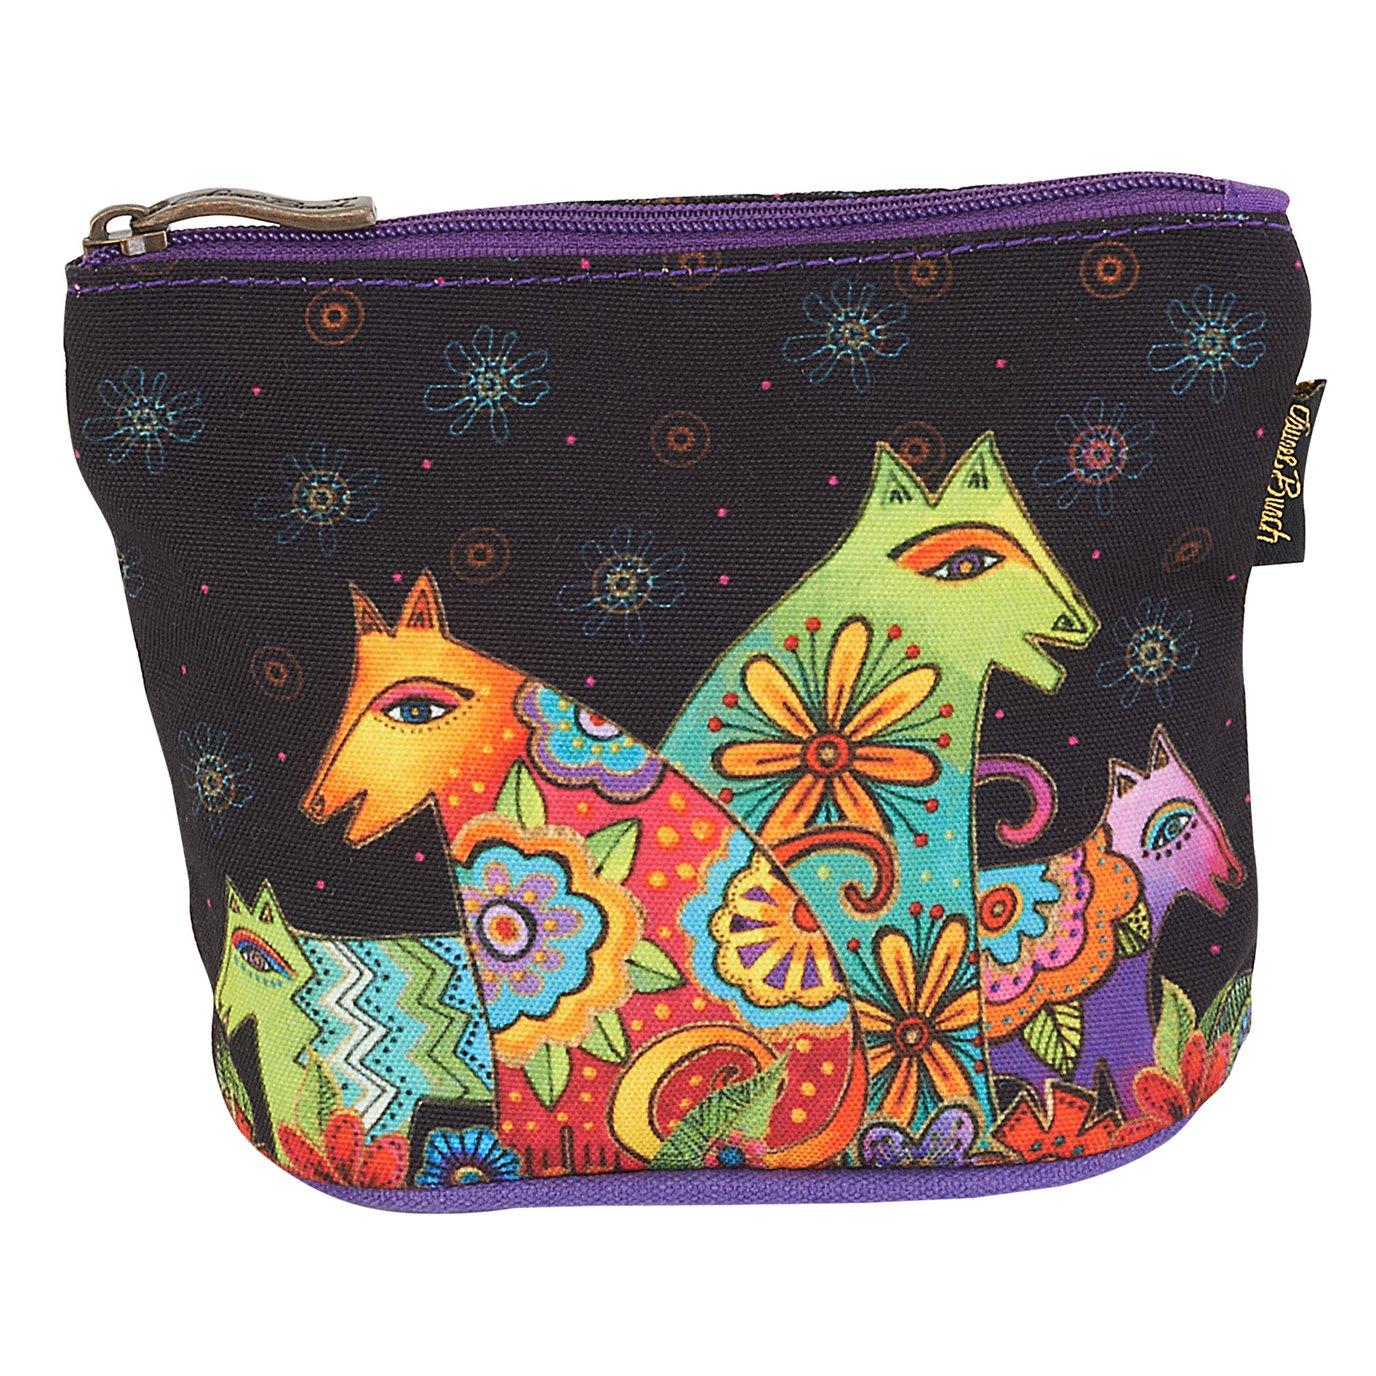 Laurel Burch Canine Friends Mini Cosmetic Bag - black